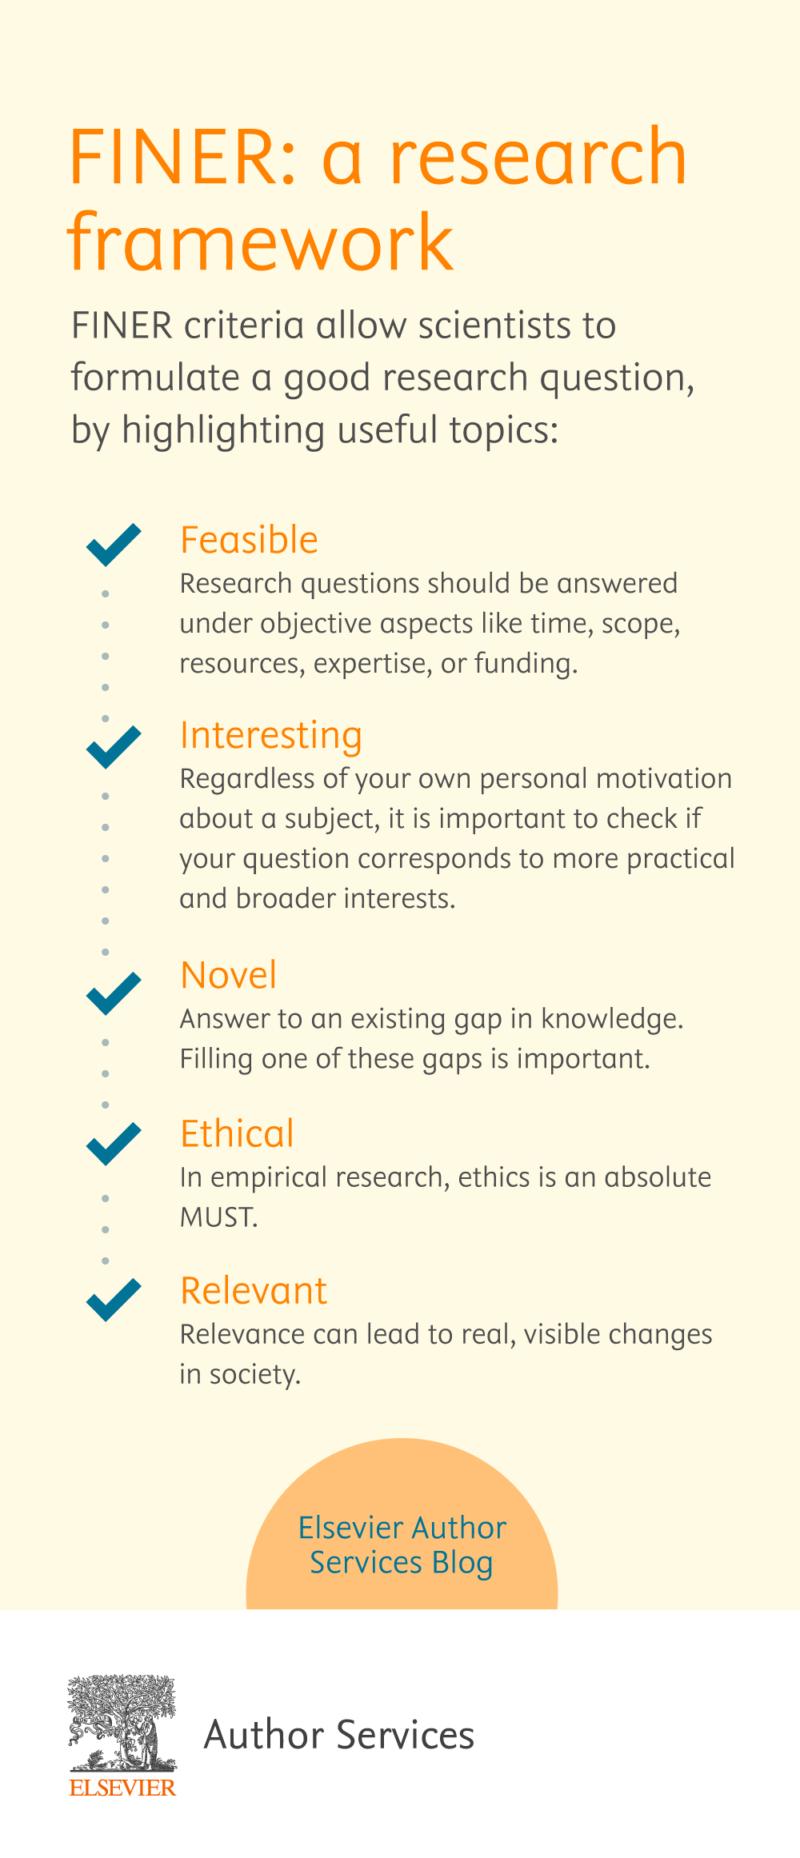 FINER a research framework